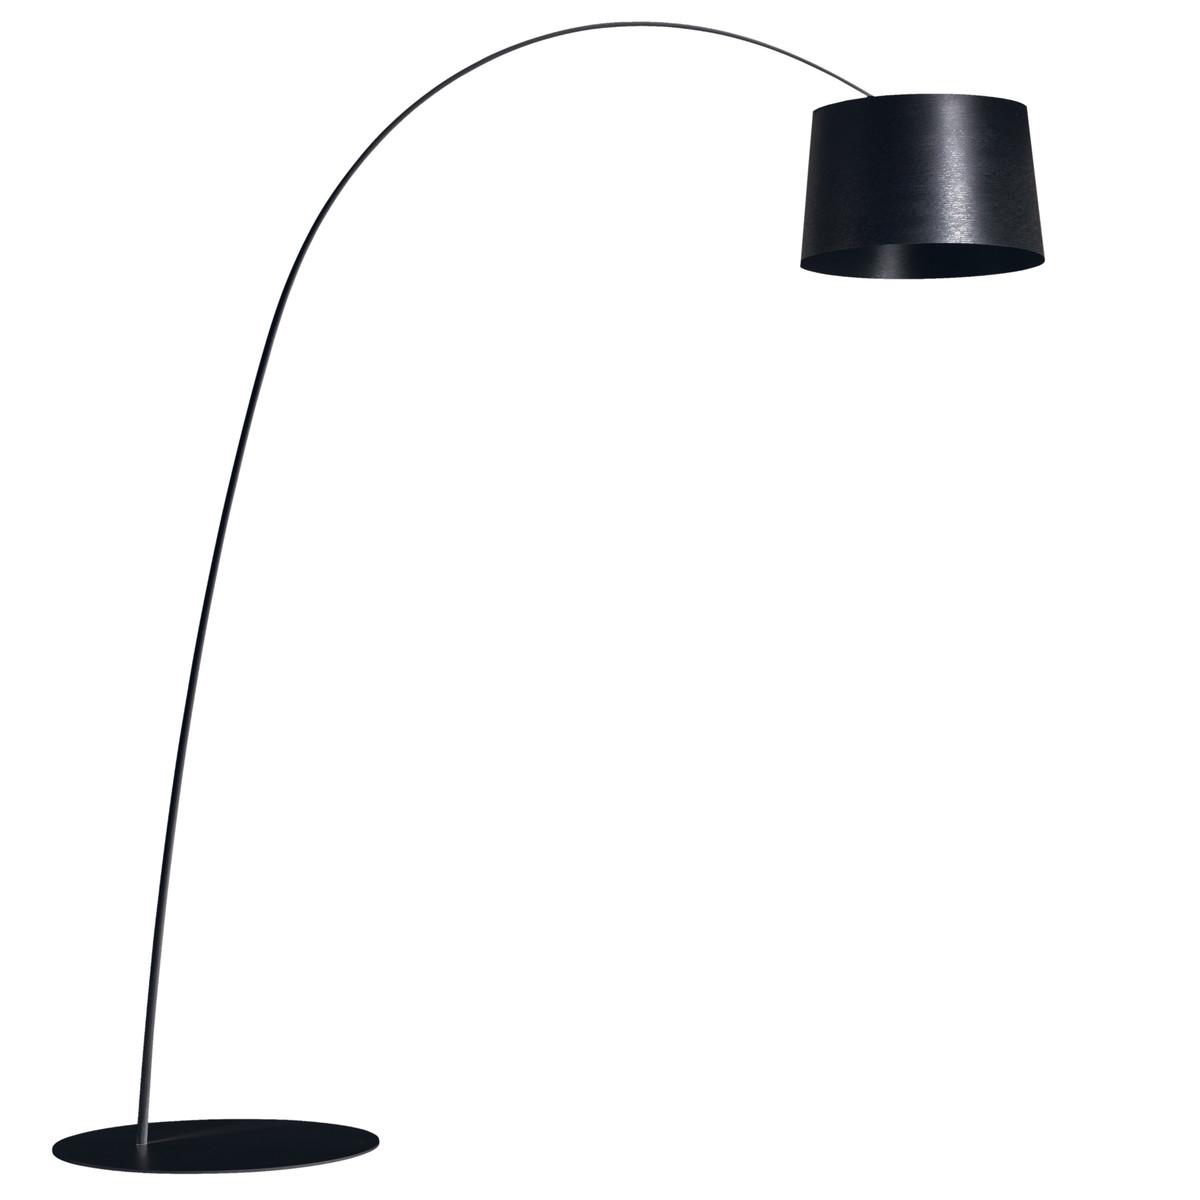 Foscarini Twiggy Floor Lamp | modern design by ...